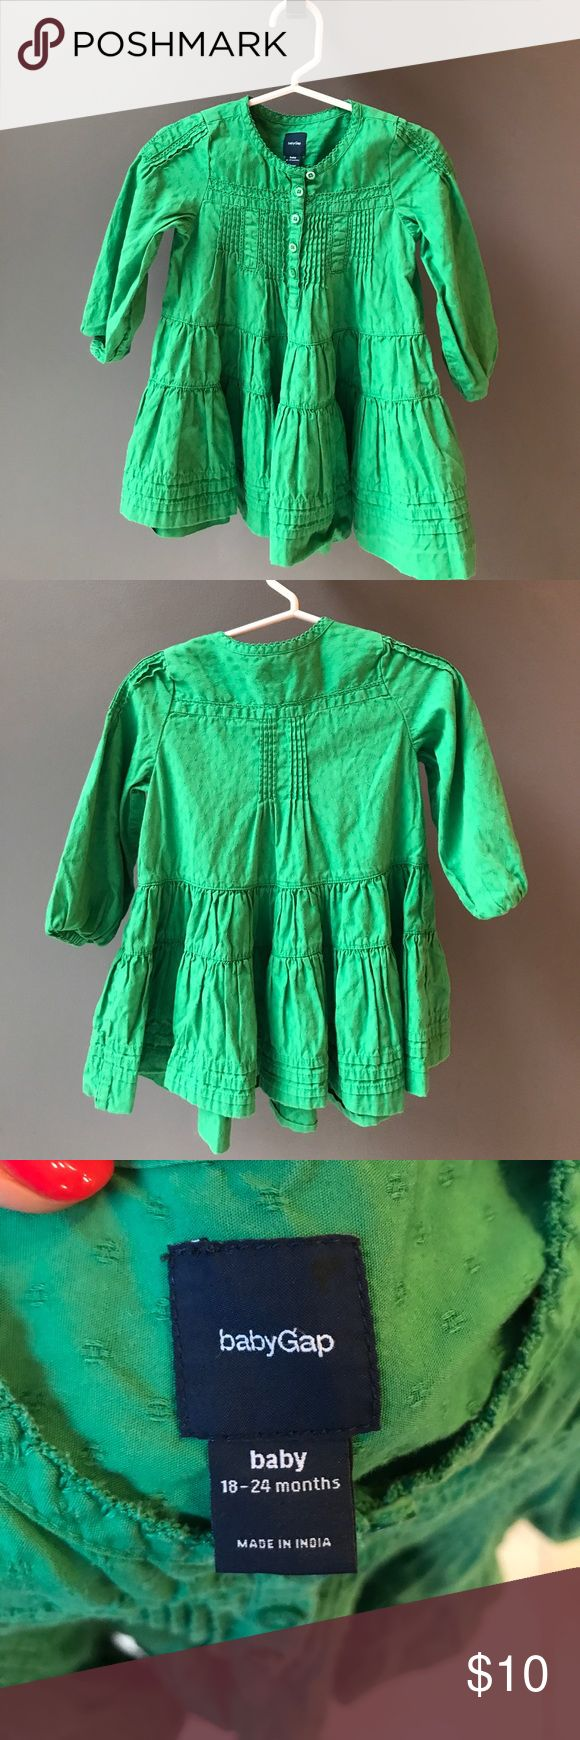 Baby Gap adorable bohemian dress! Kelly green! Baby Gap adorable bohemian dress! Kelly green! GAP Dresses